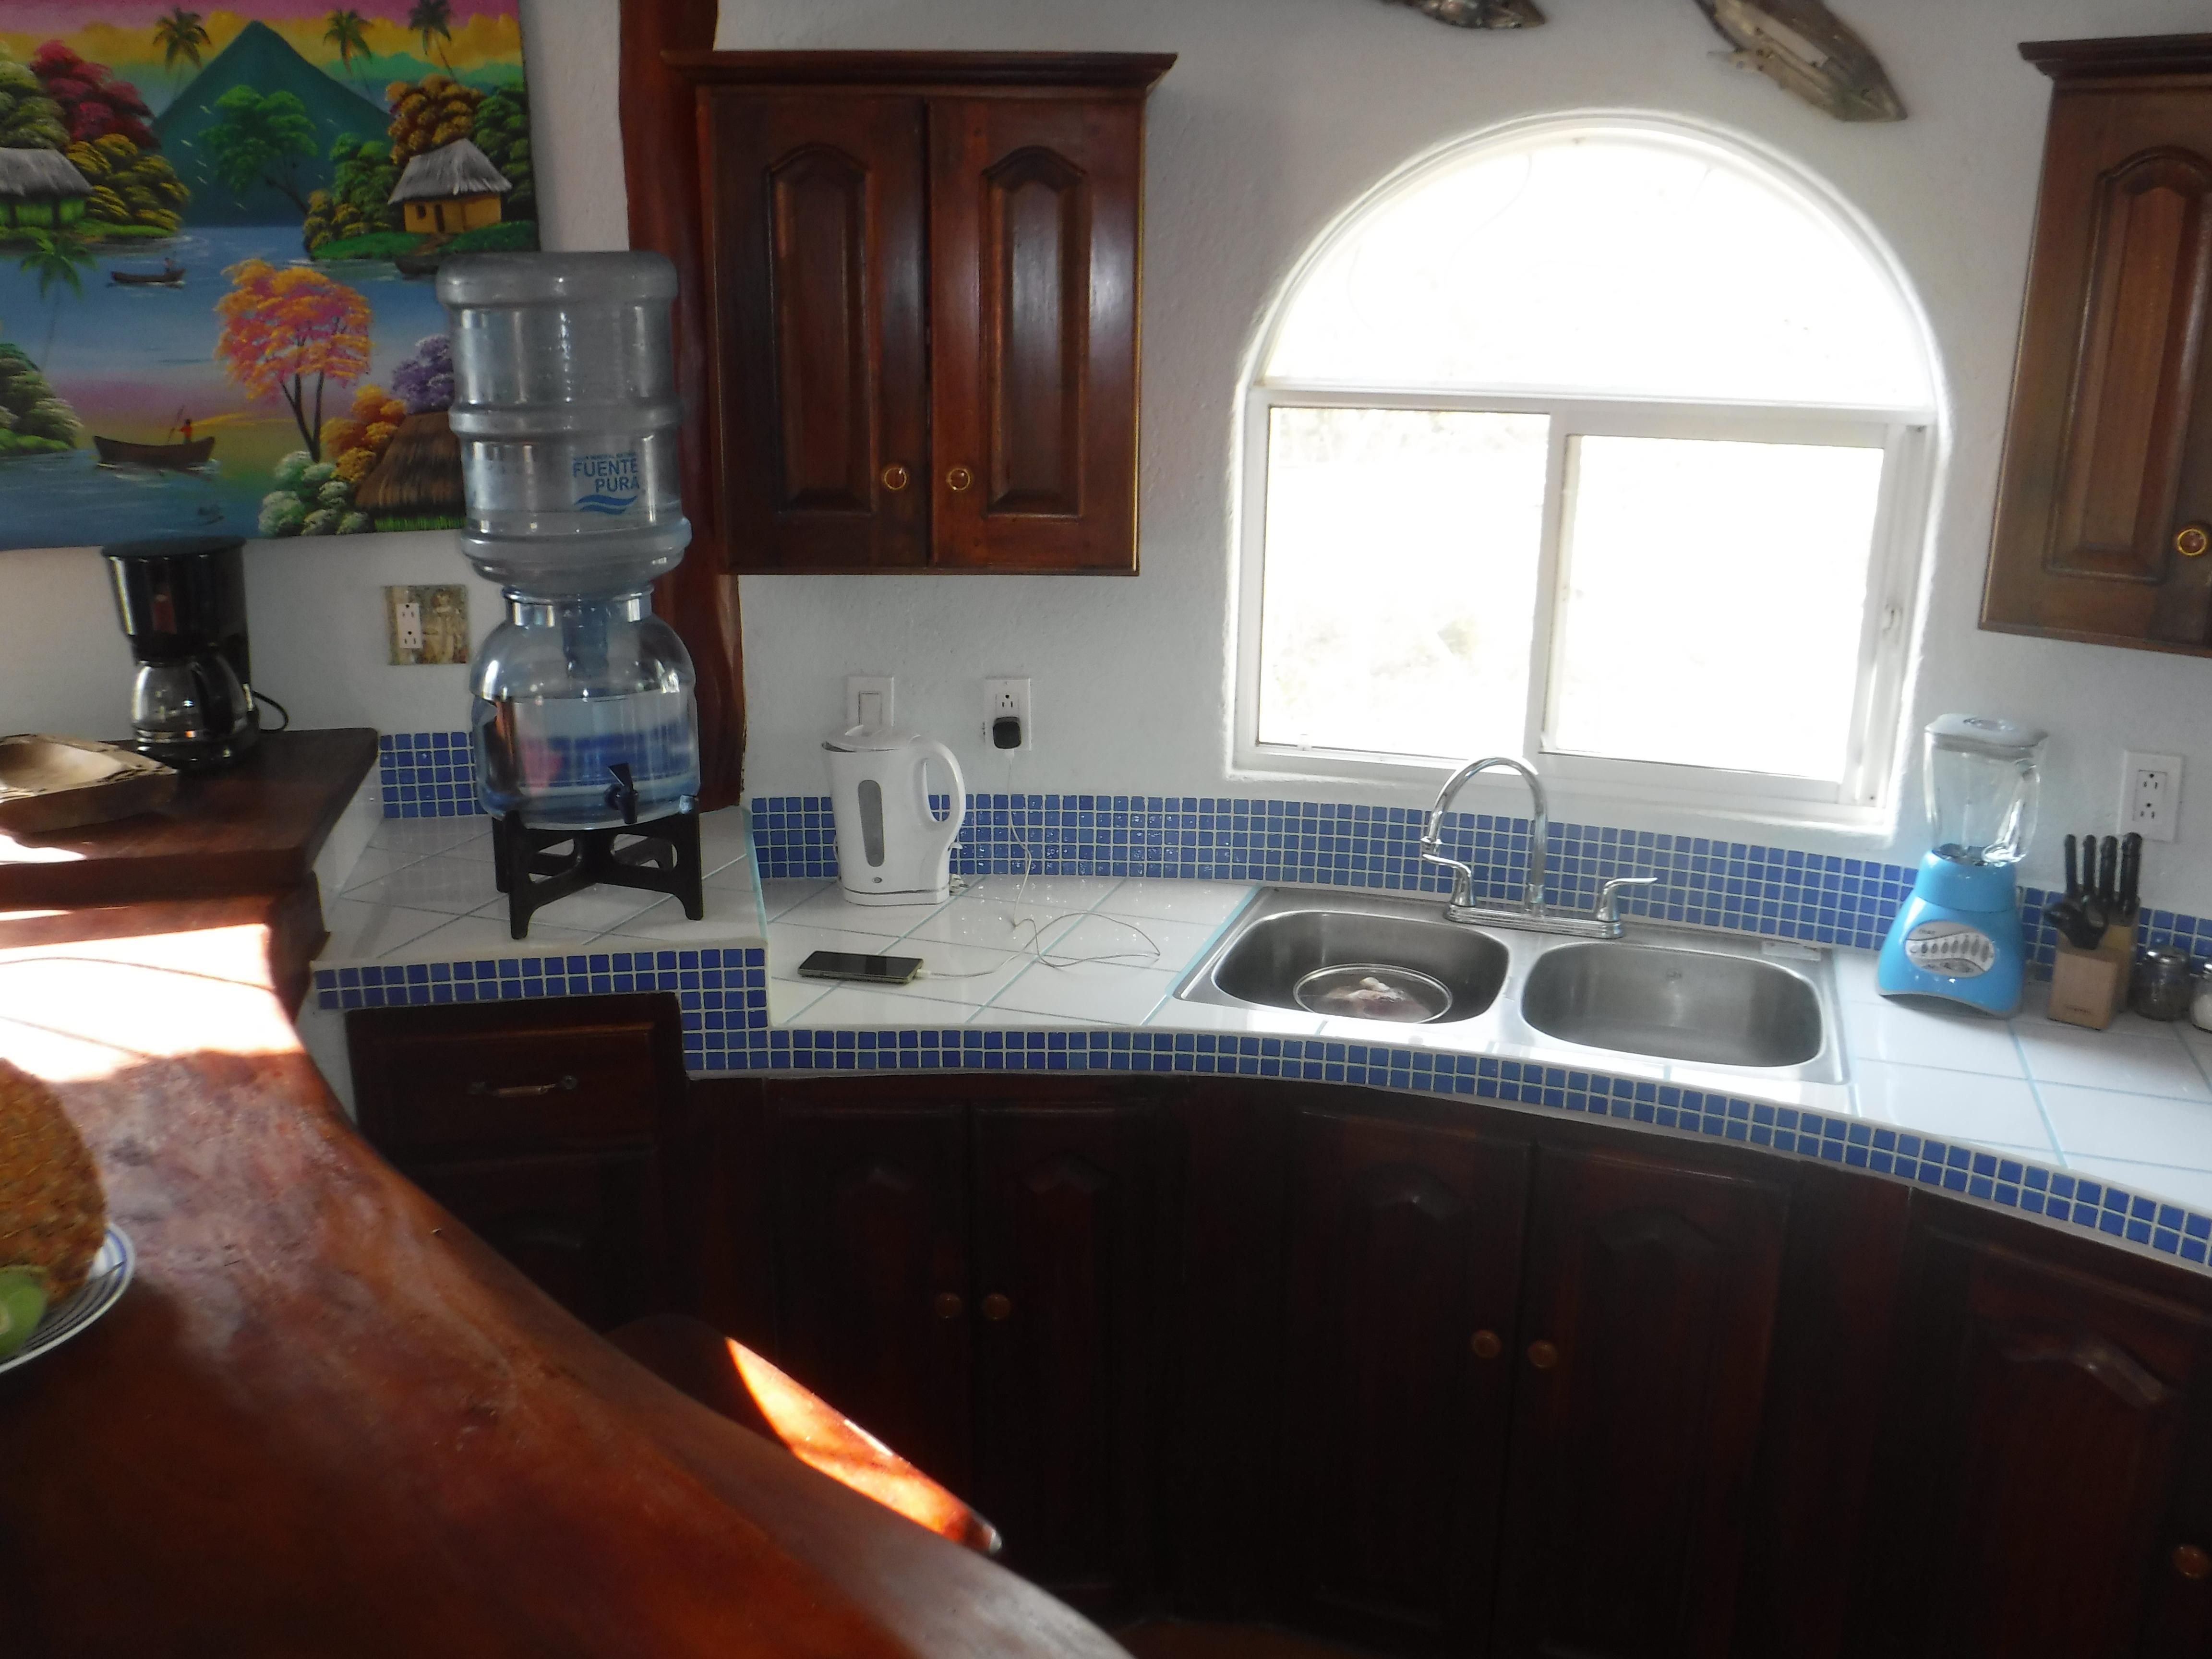 Prado Hills Update and OBrien Delicias Casa 054